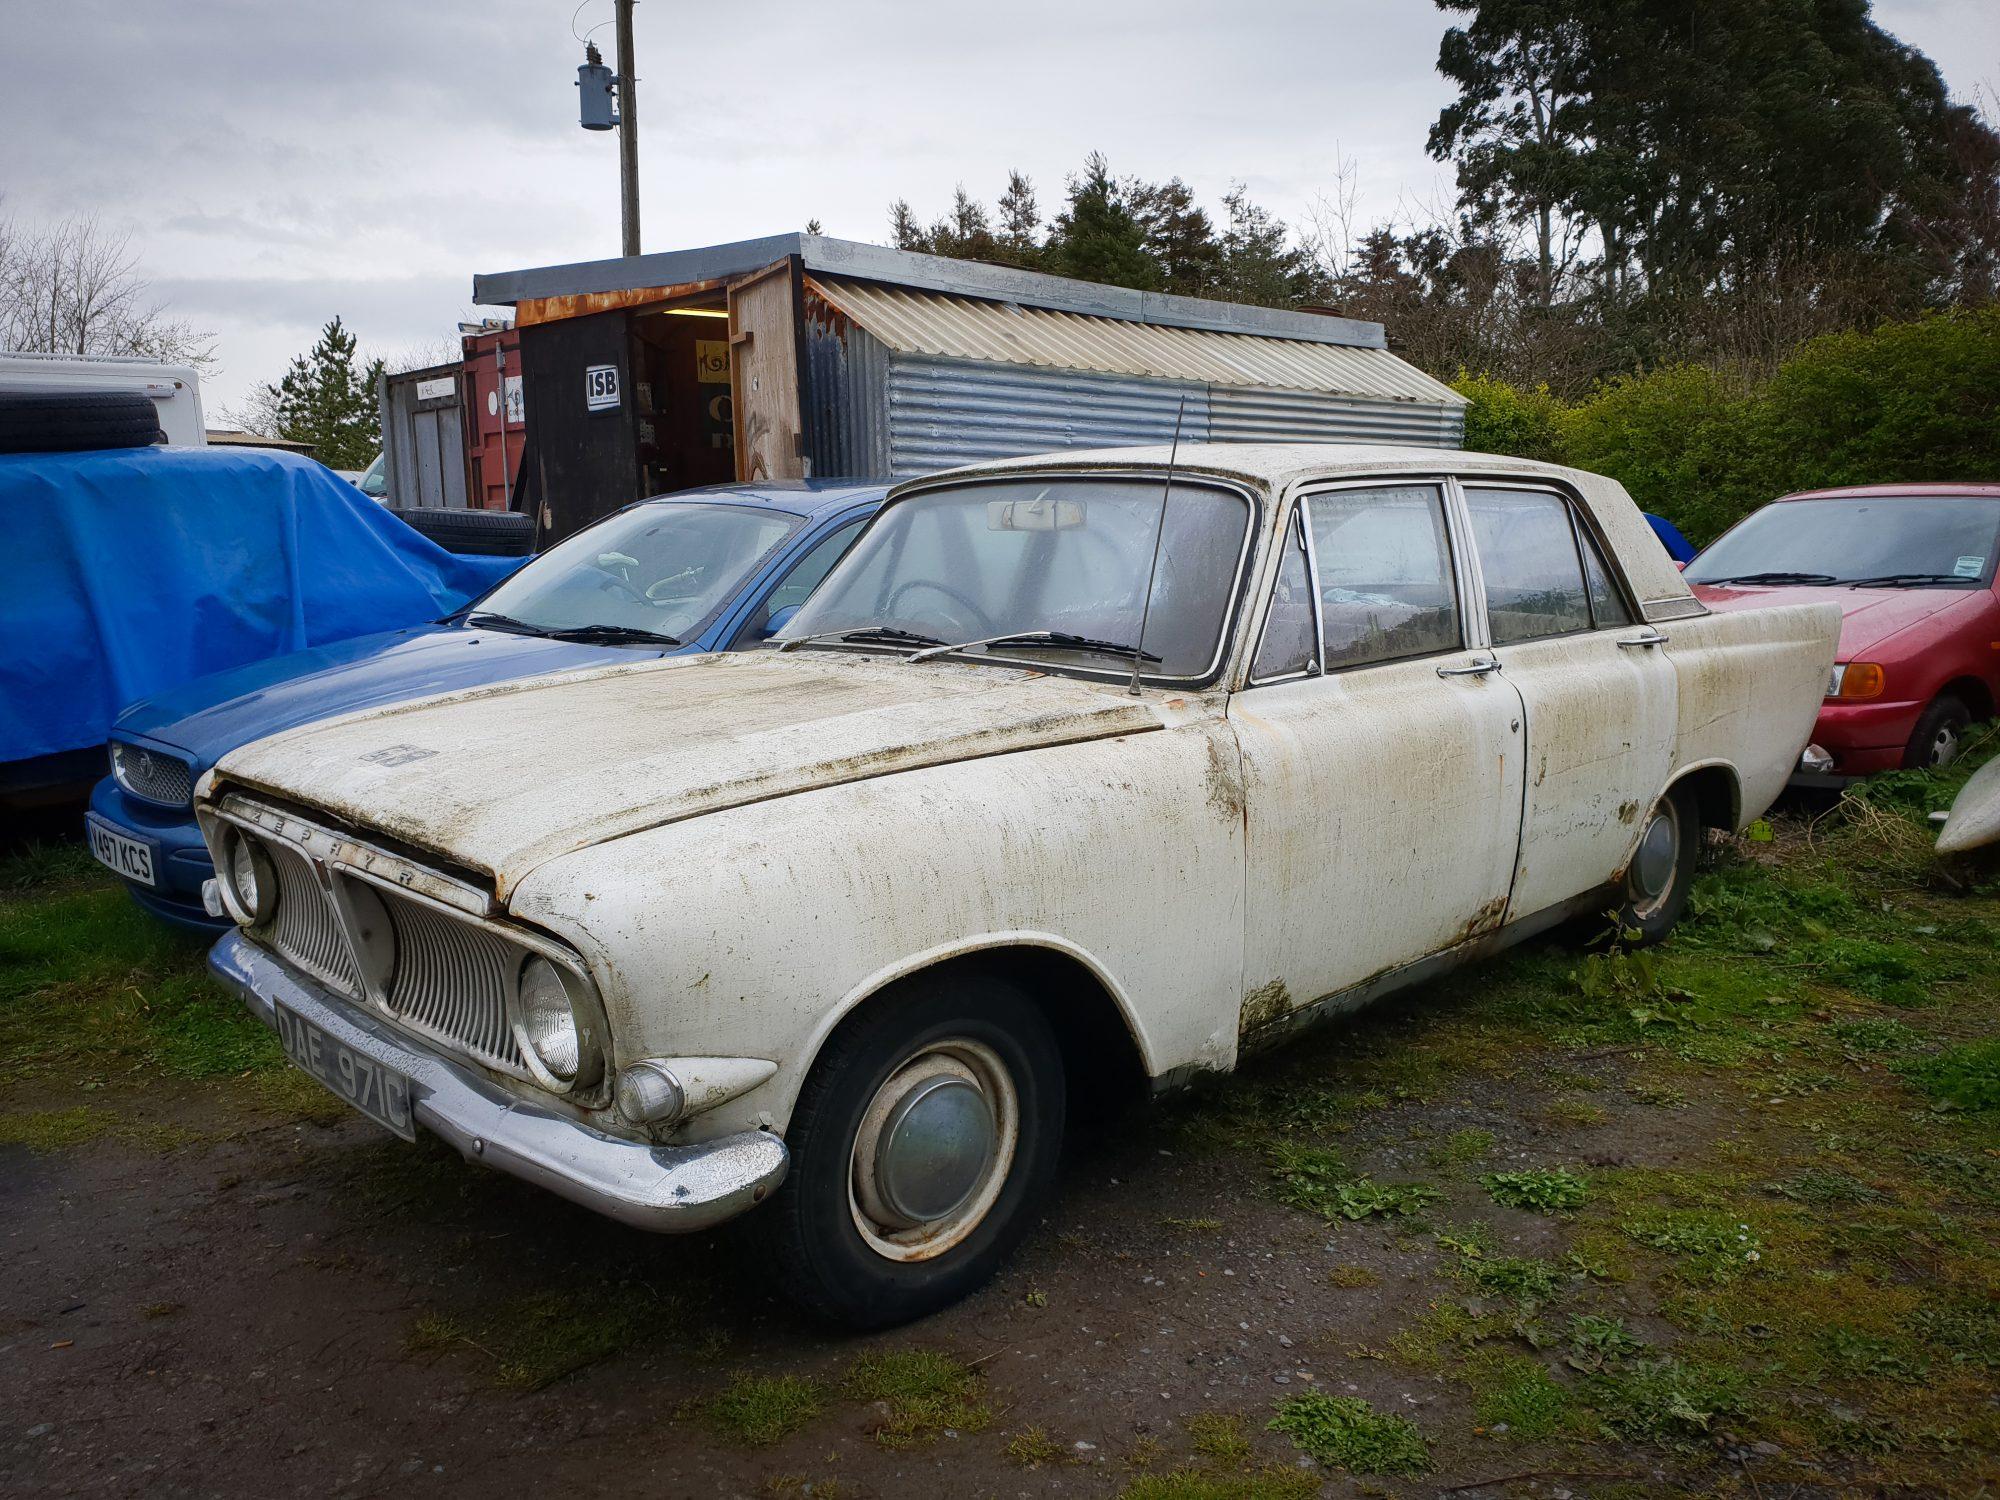 Ford, Ford Zephyr, Zephyr, restoration project, Zephyr front